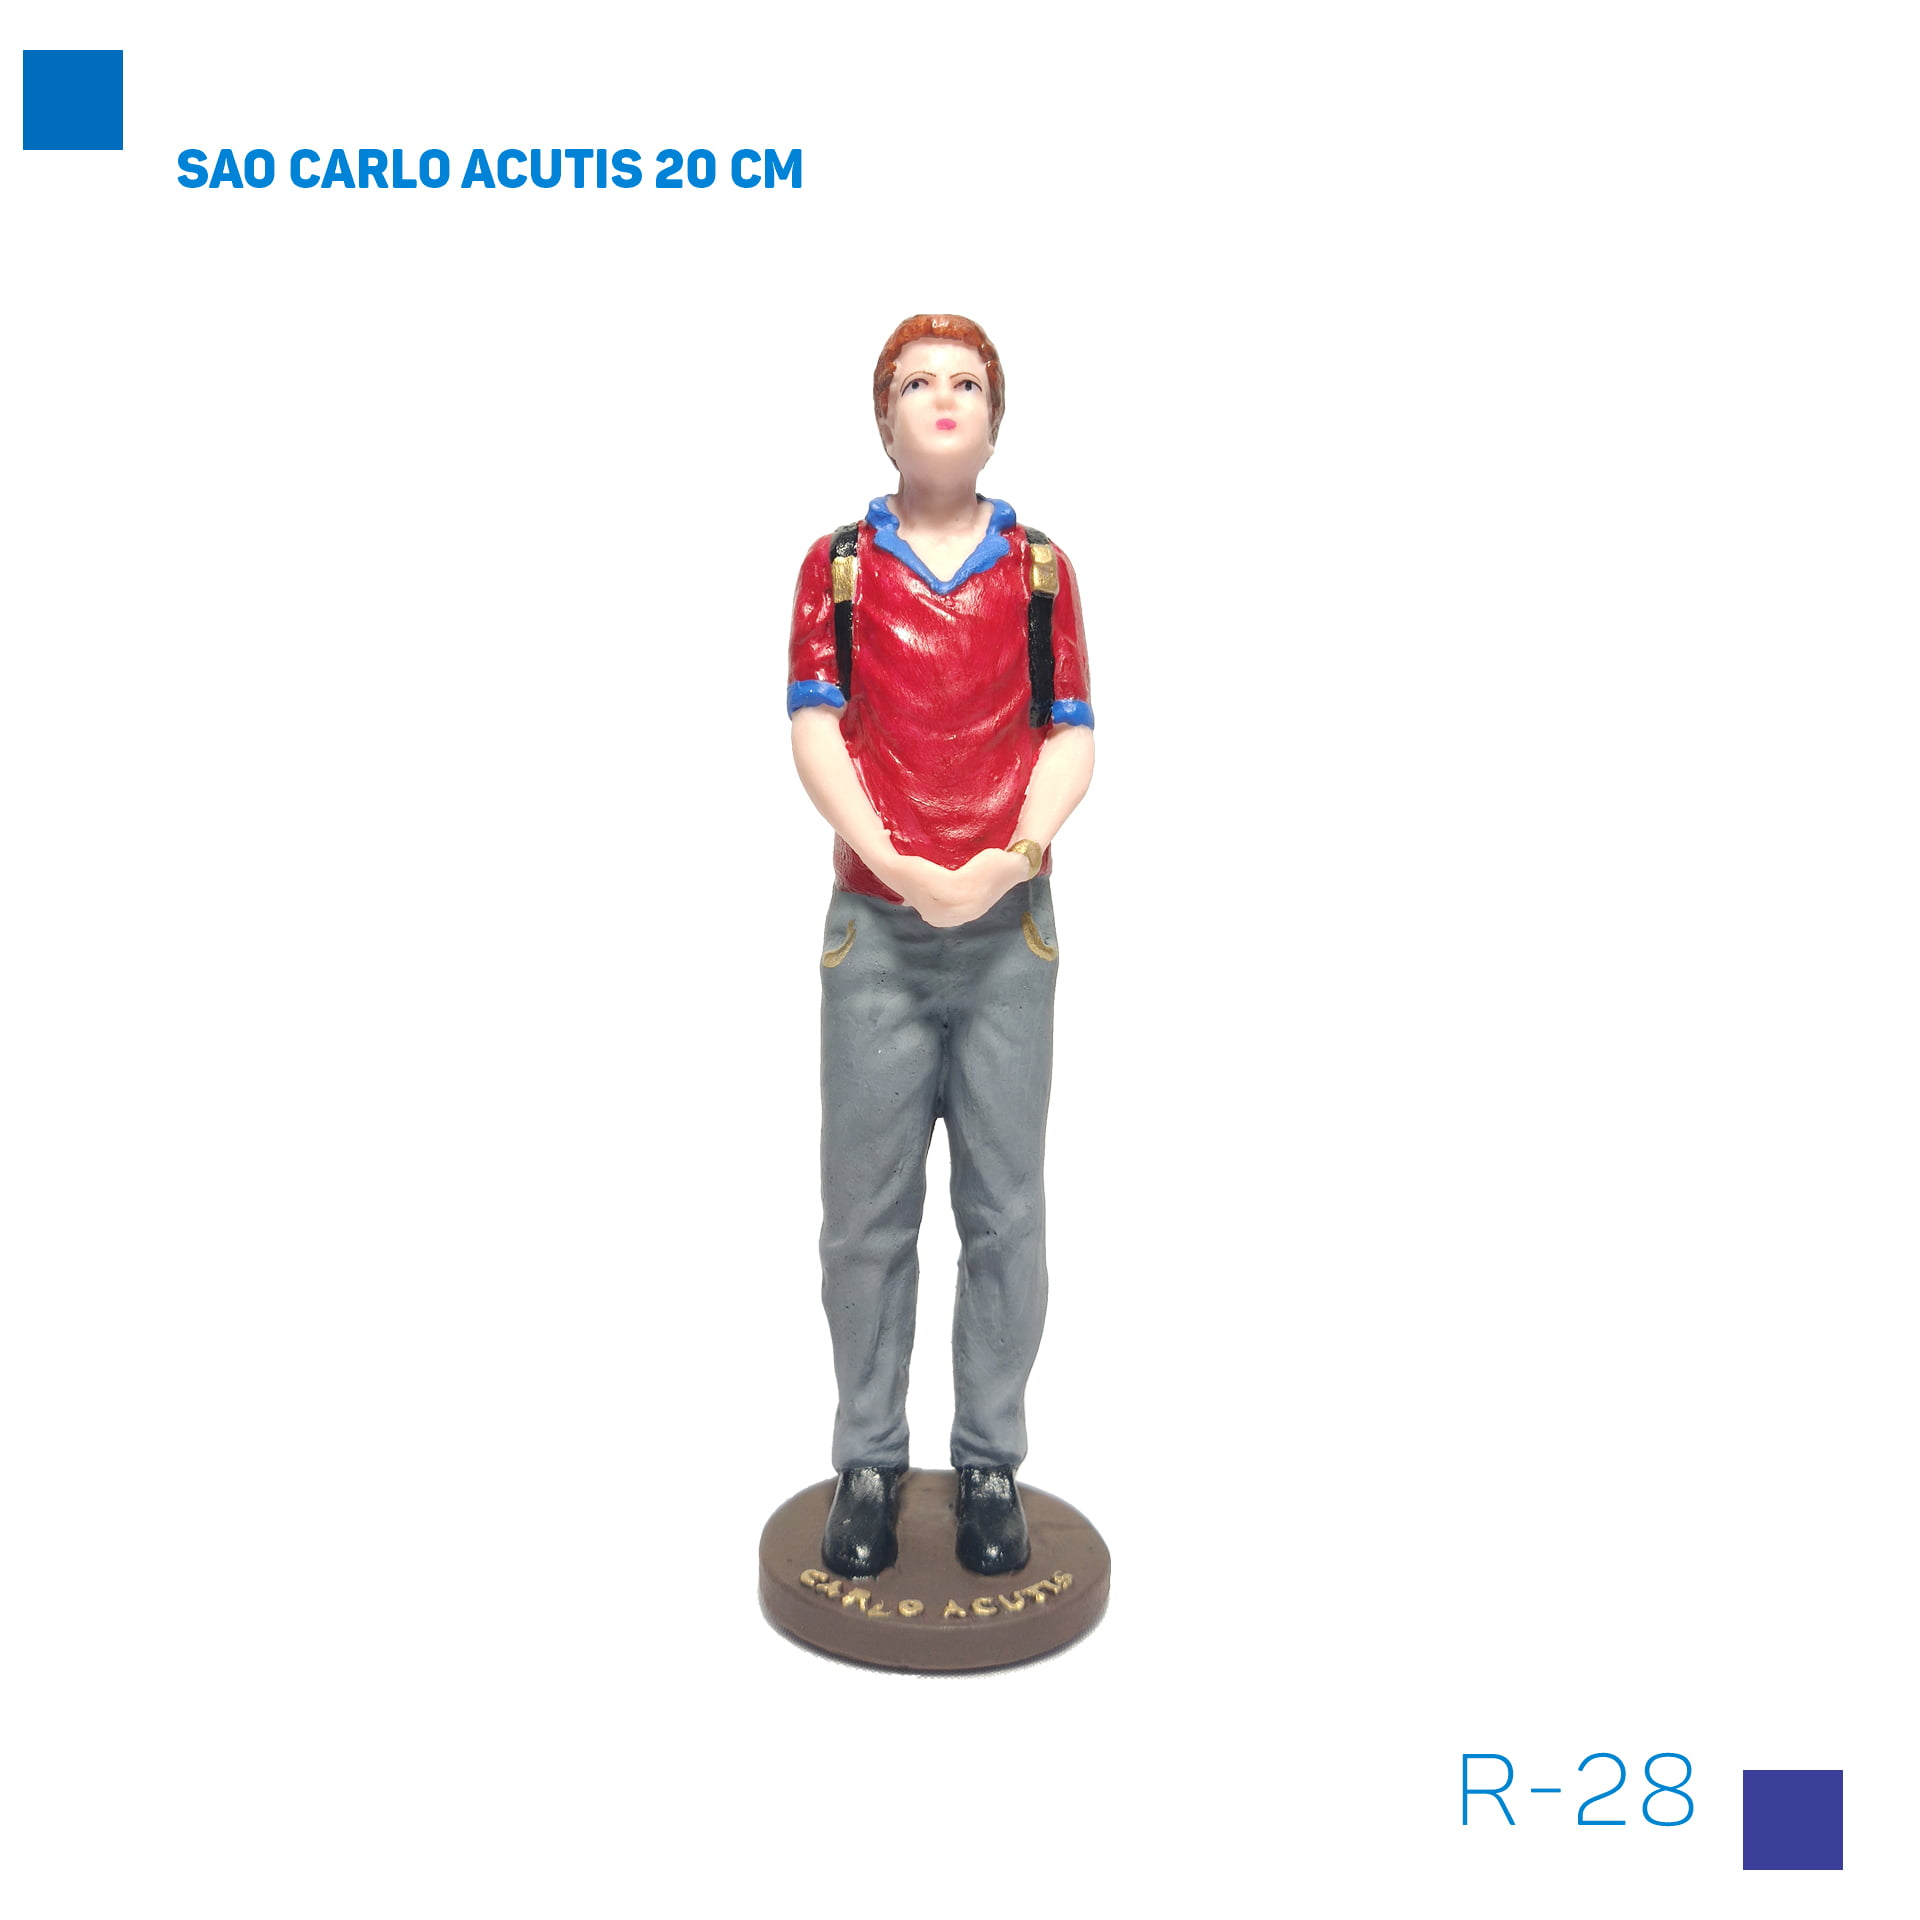 Bira Artigos Religiosos - SAO CARLO ACUTIS 20 CM Cod. R-29